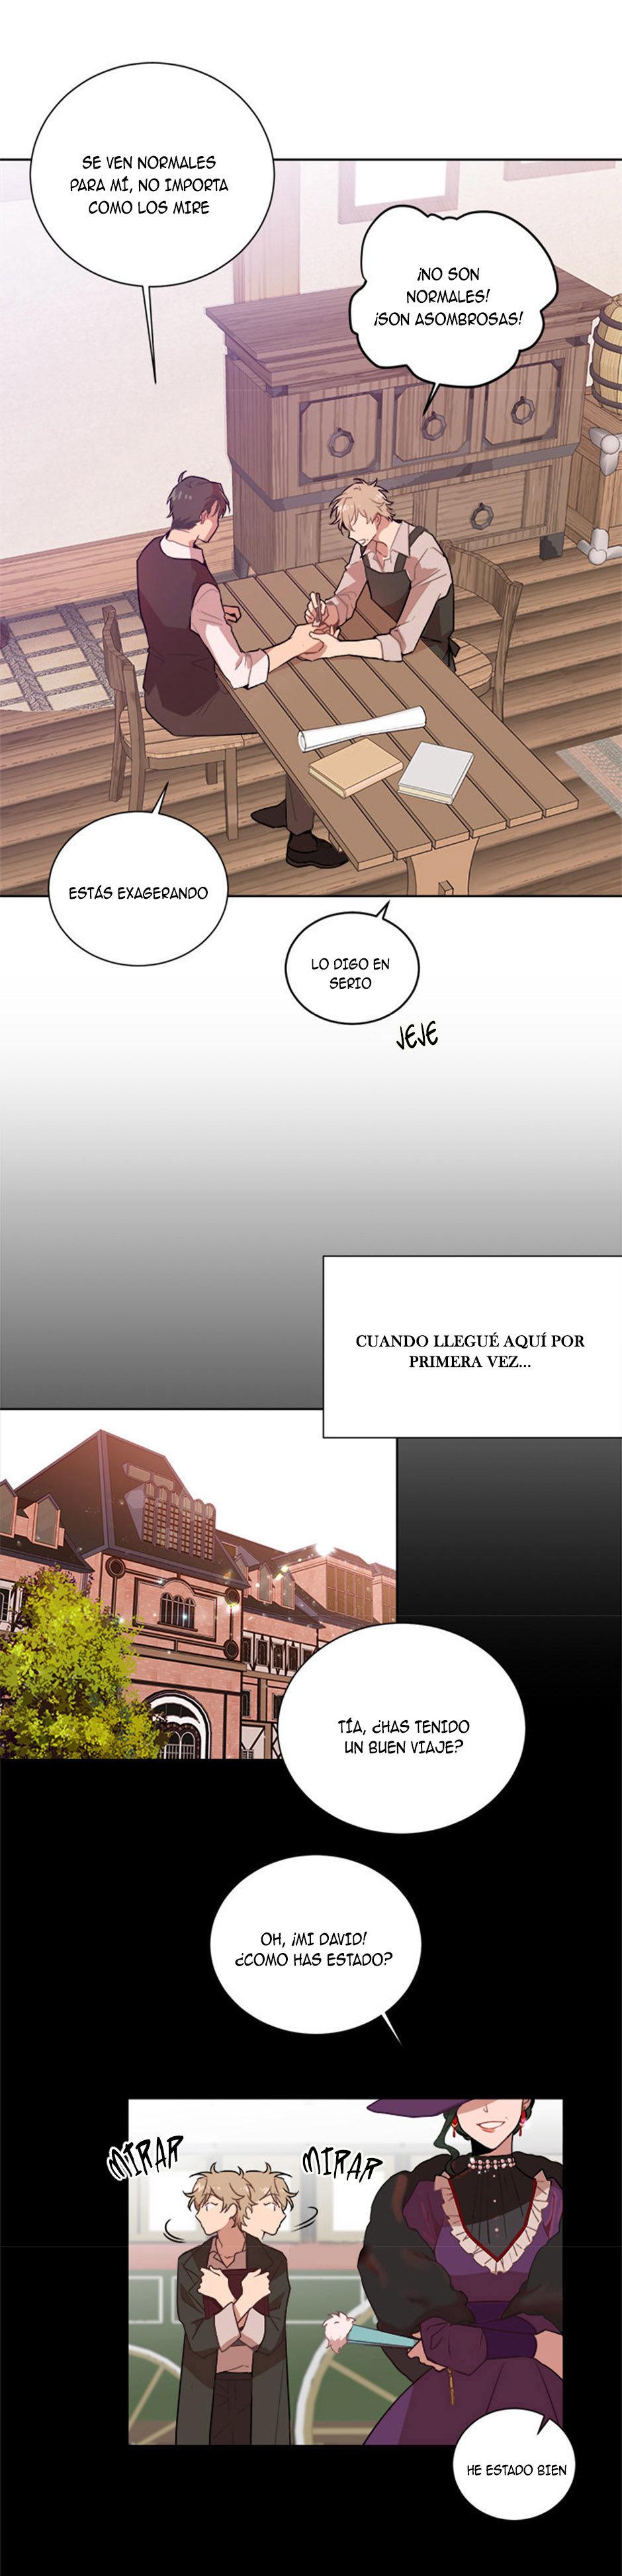 https://nine.mangadogs.com/es_manga/pic8/61/36669/946551/03884408ebb583e1d5970576190177e0.jpg Page 11